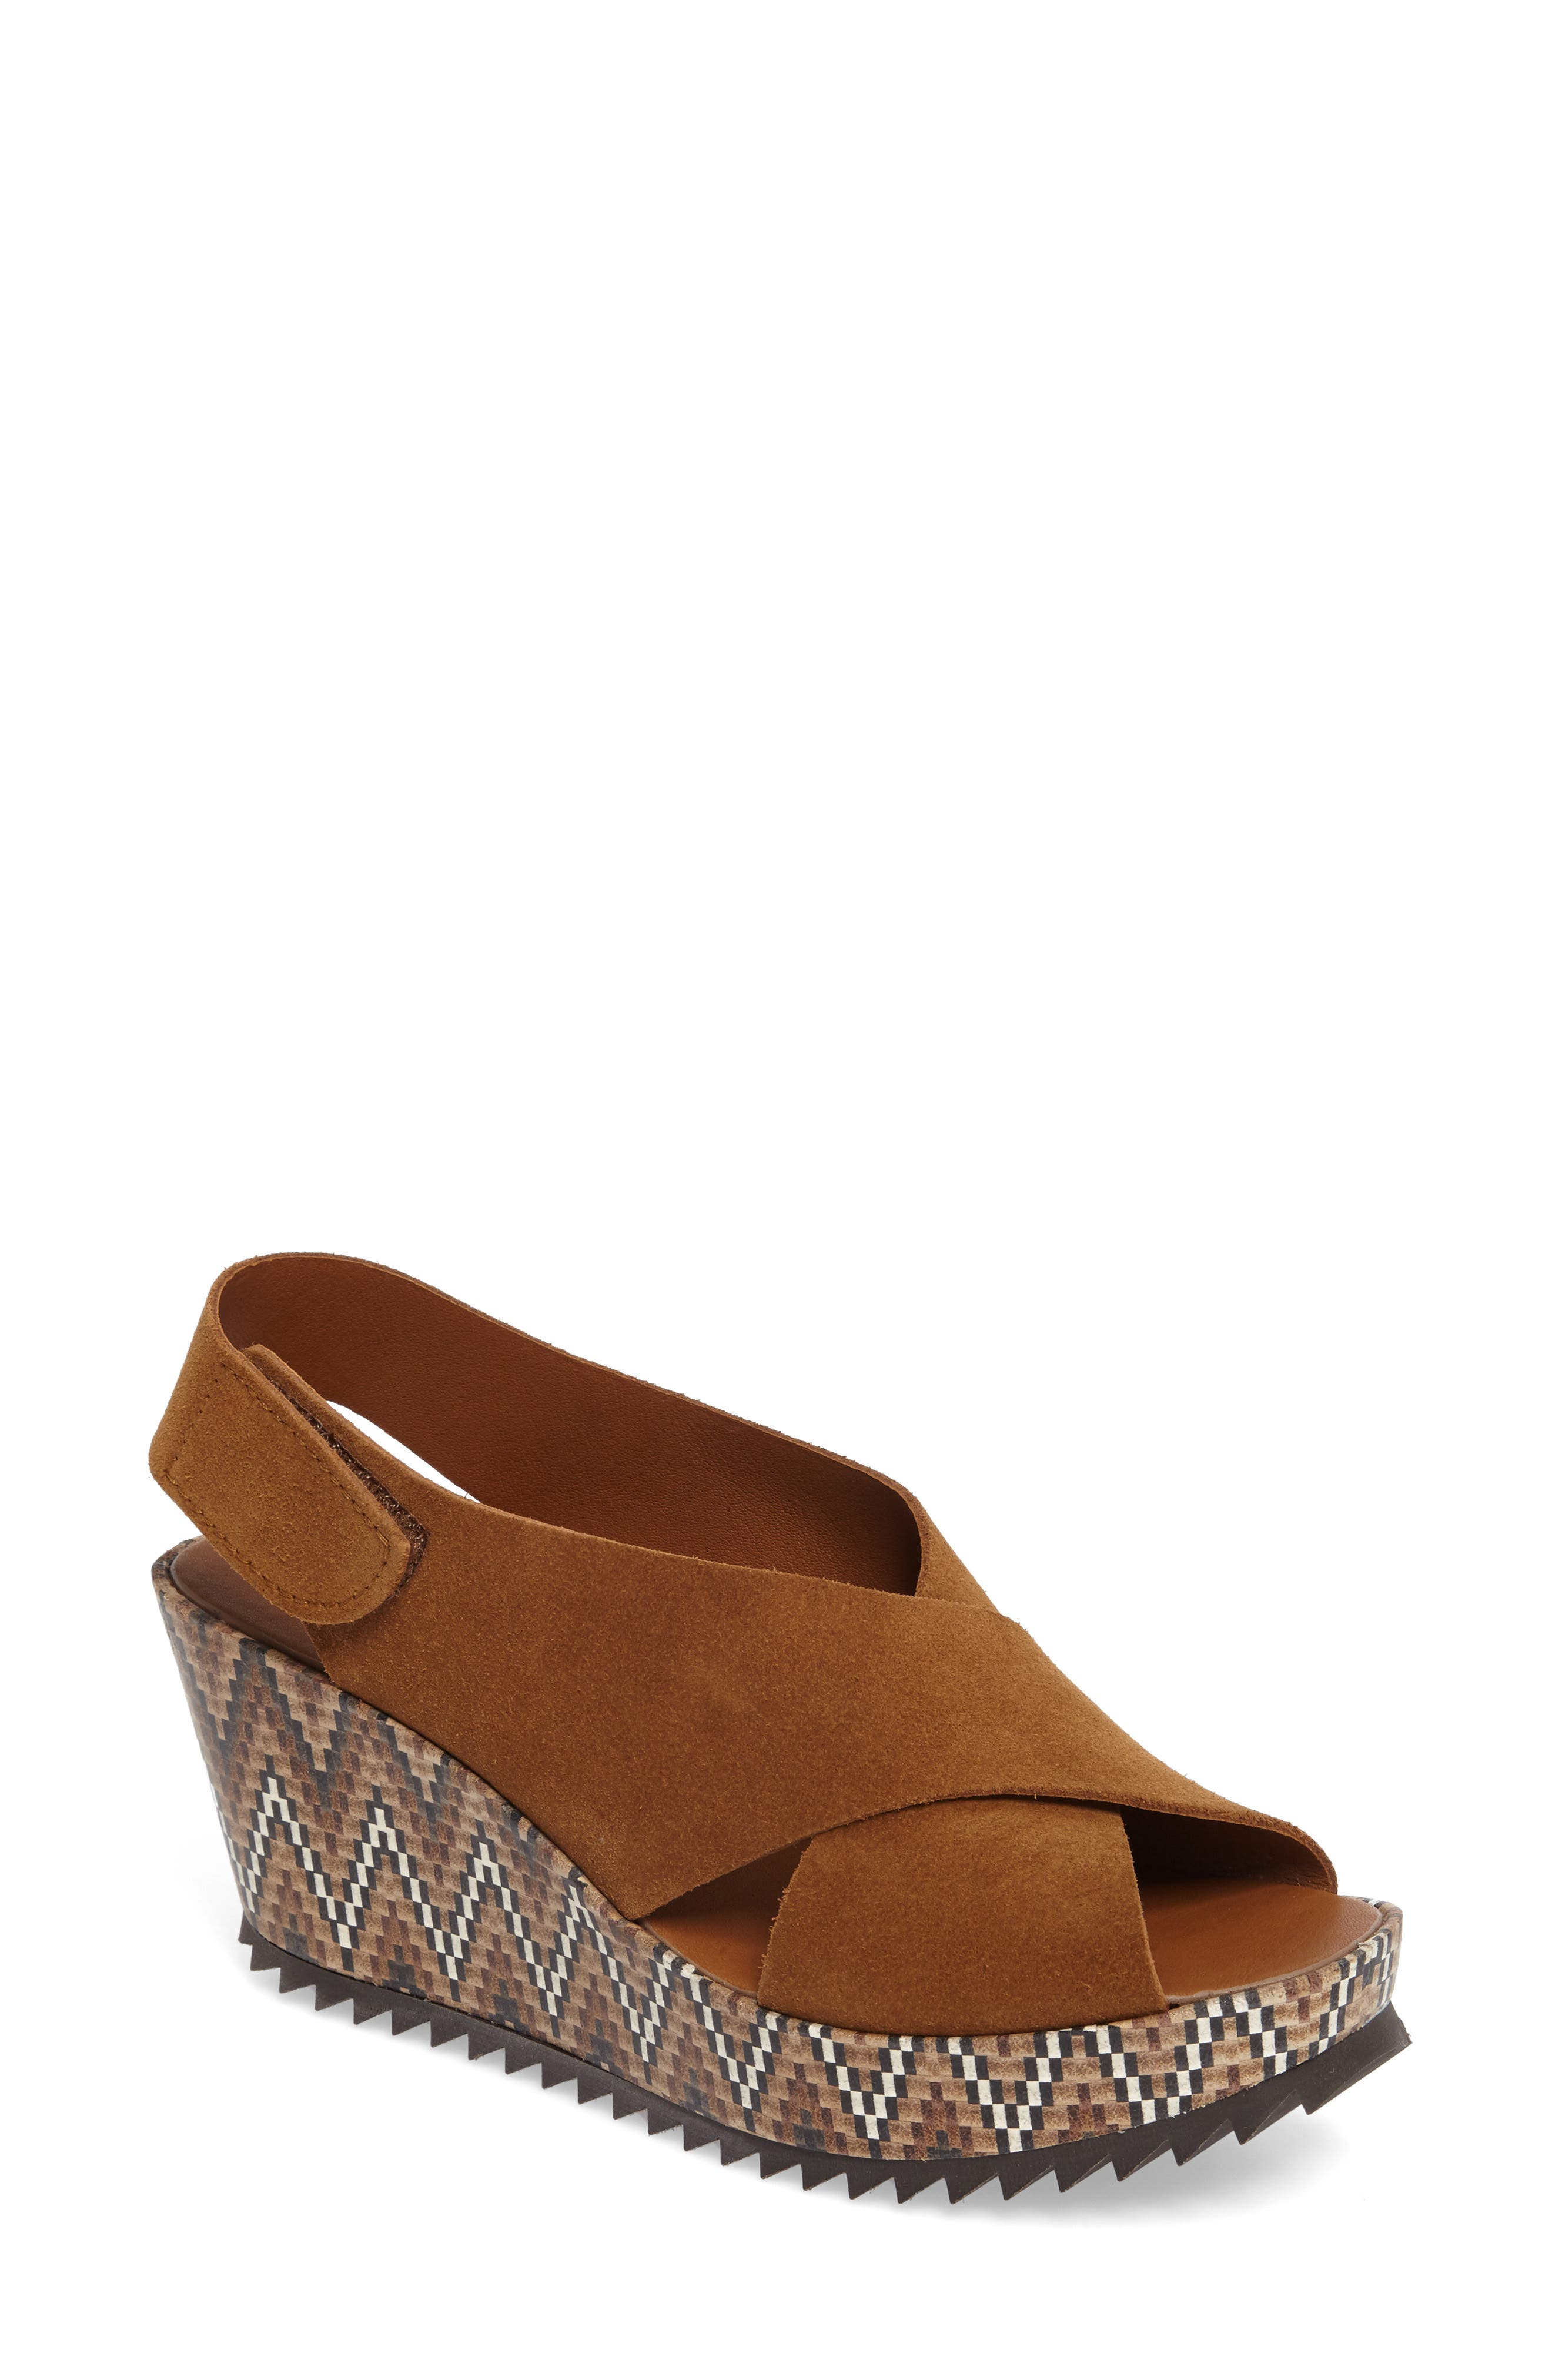 'Federica' Wedge Sandal,                             Main thumbnail 2, color,